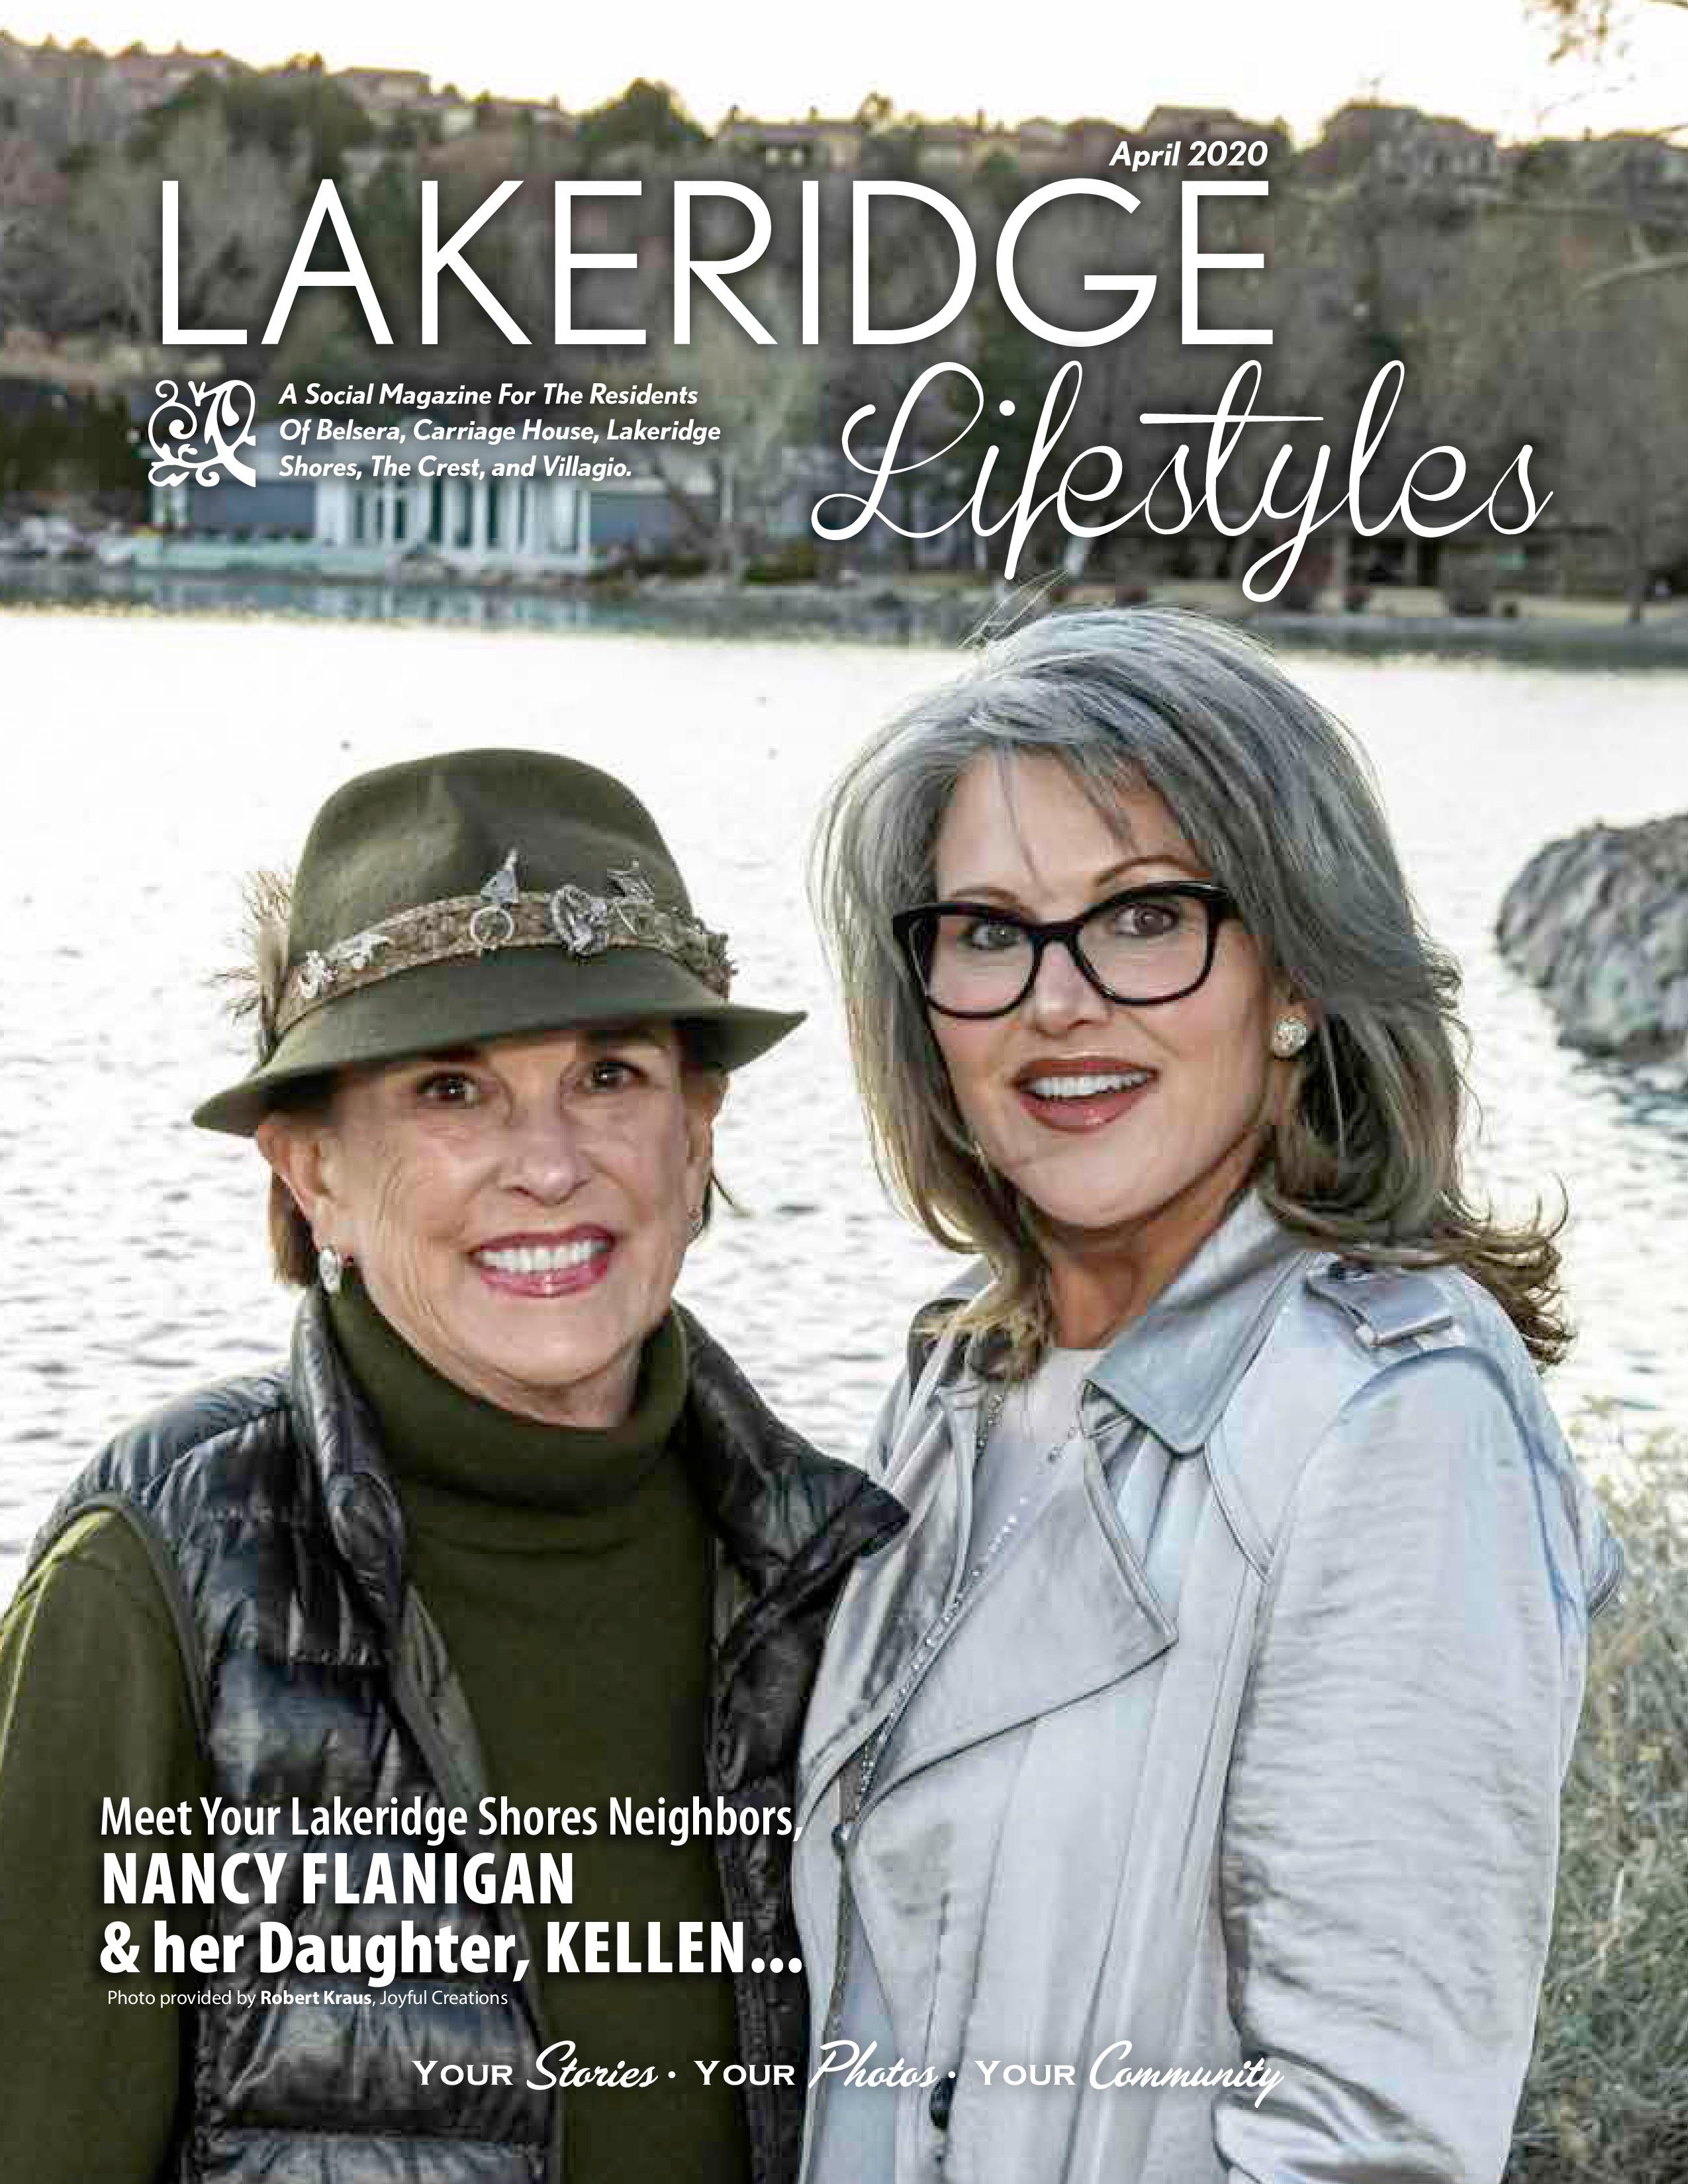 Apr 2020 lakeridge lifestyles page 1